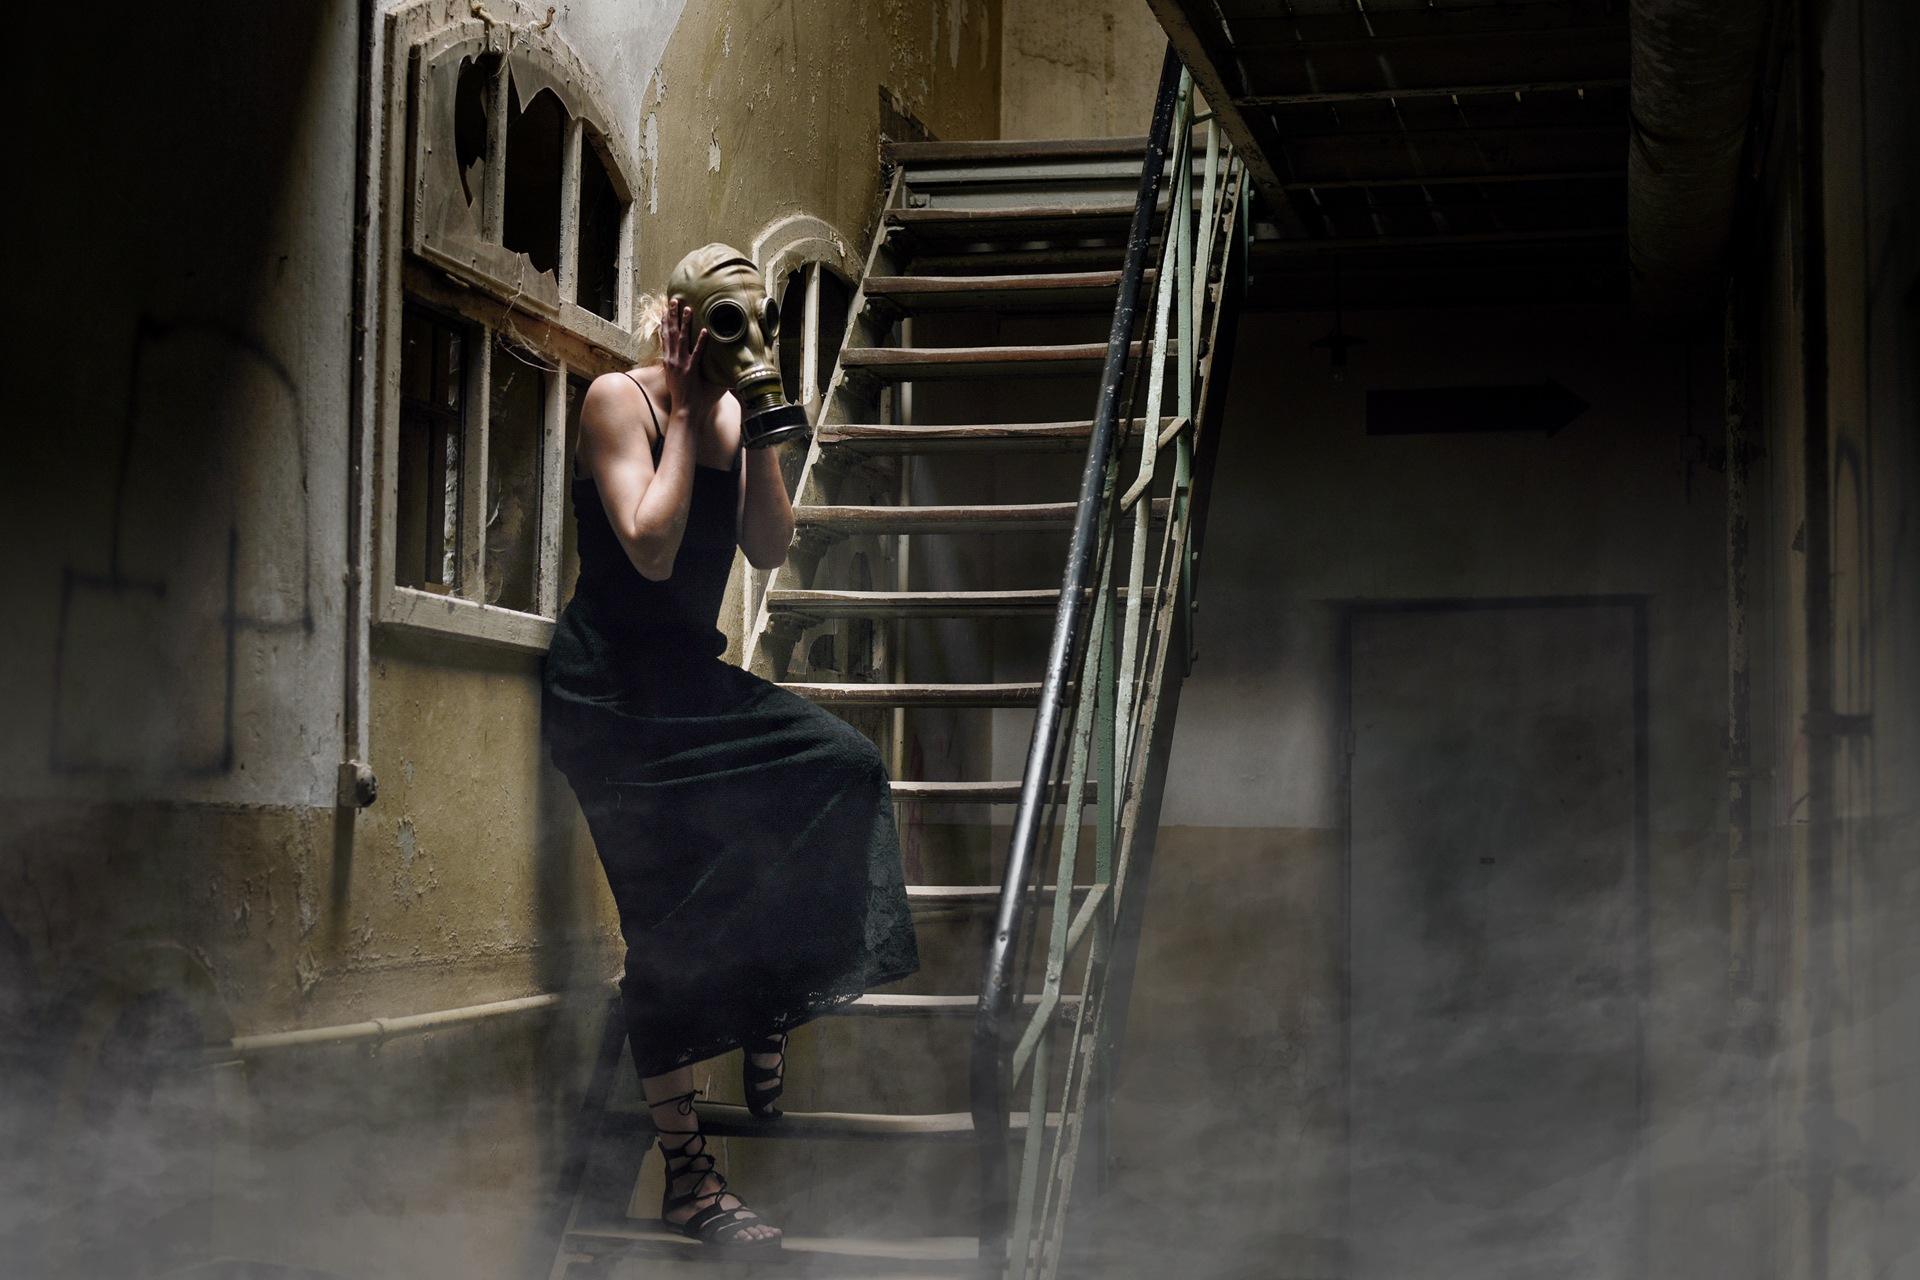 Masked Stairs by kimovitzkk